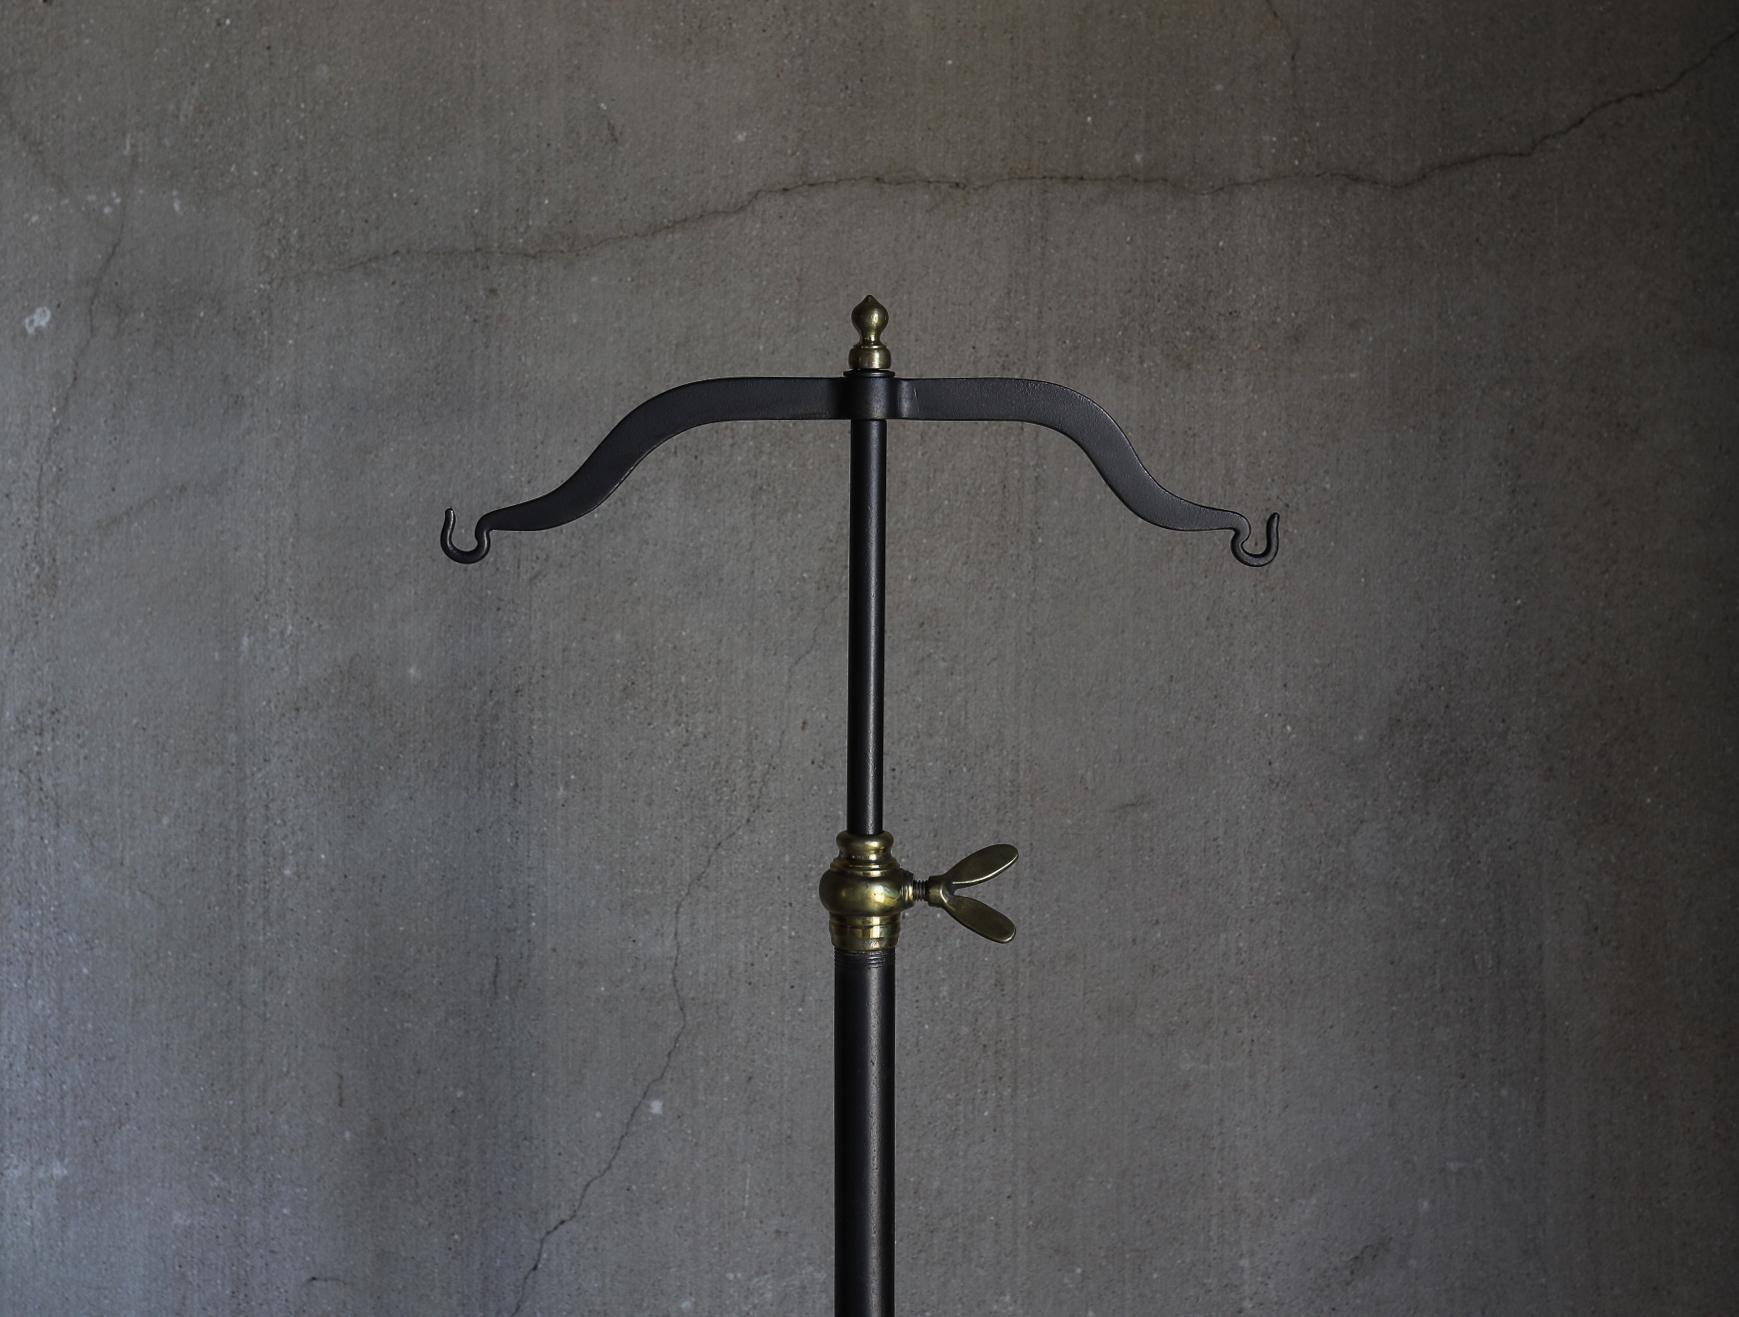 Hanger rack ‖ スタンド